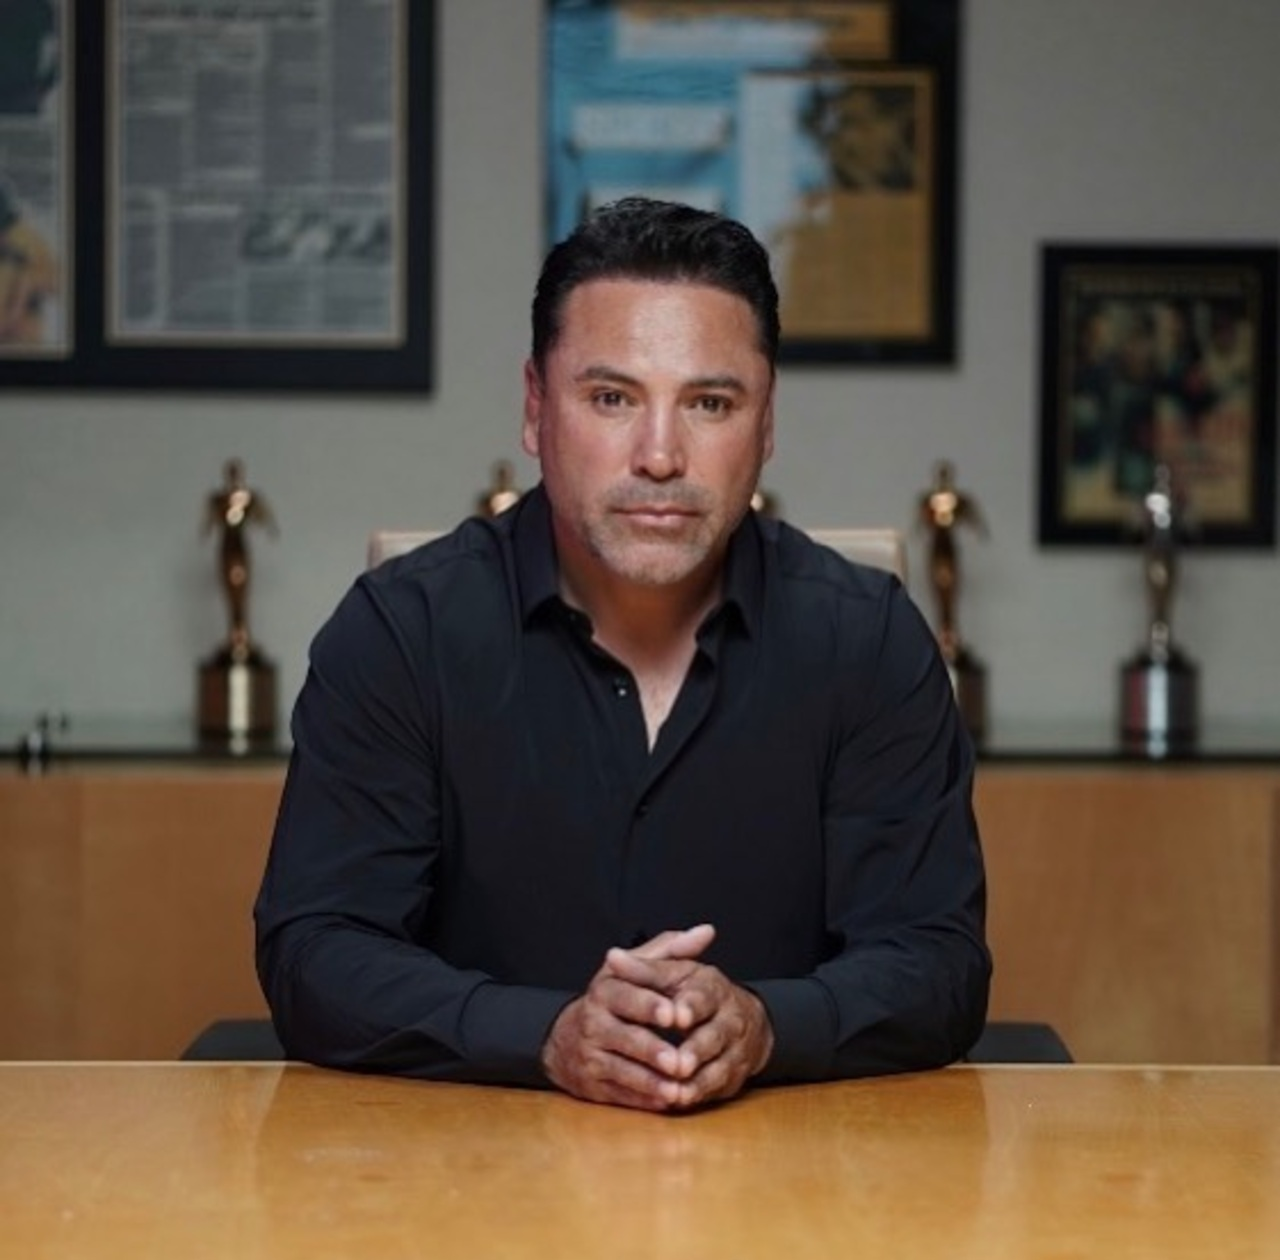 Óscar de la Hoya triste Canelo Álvarez